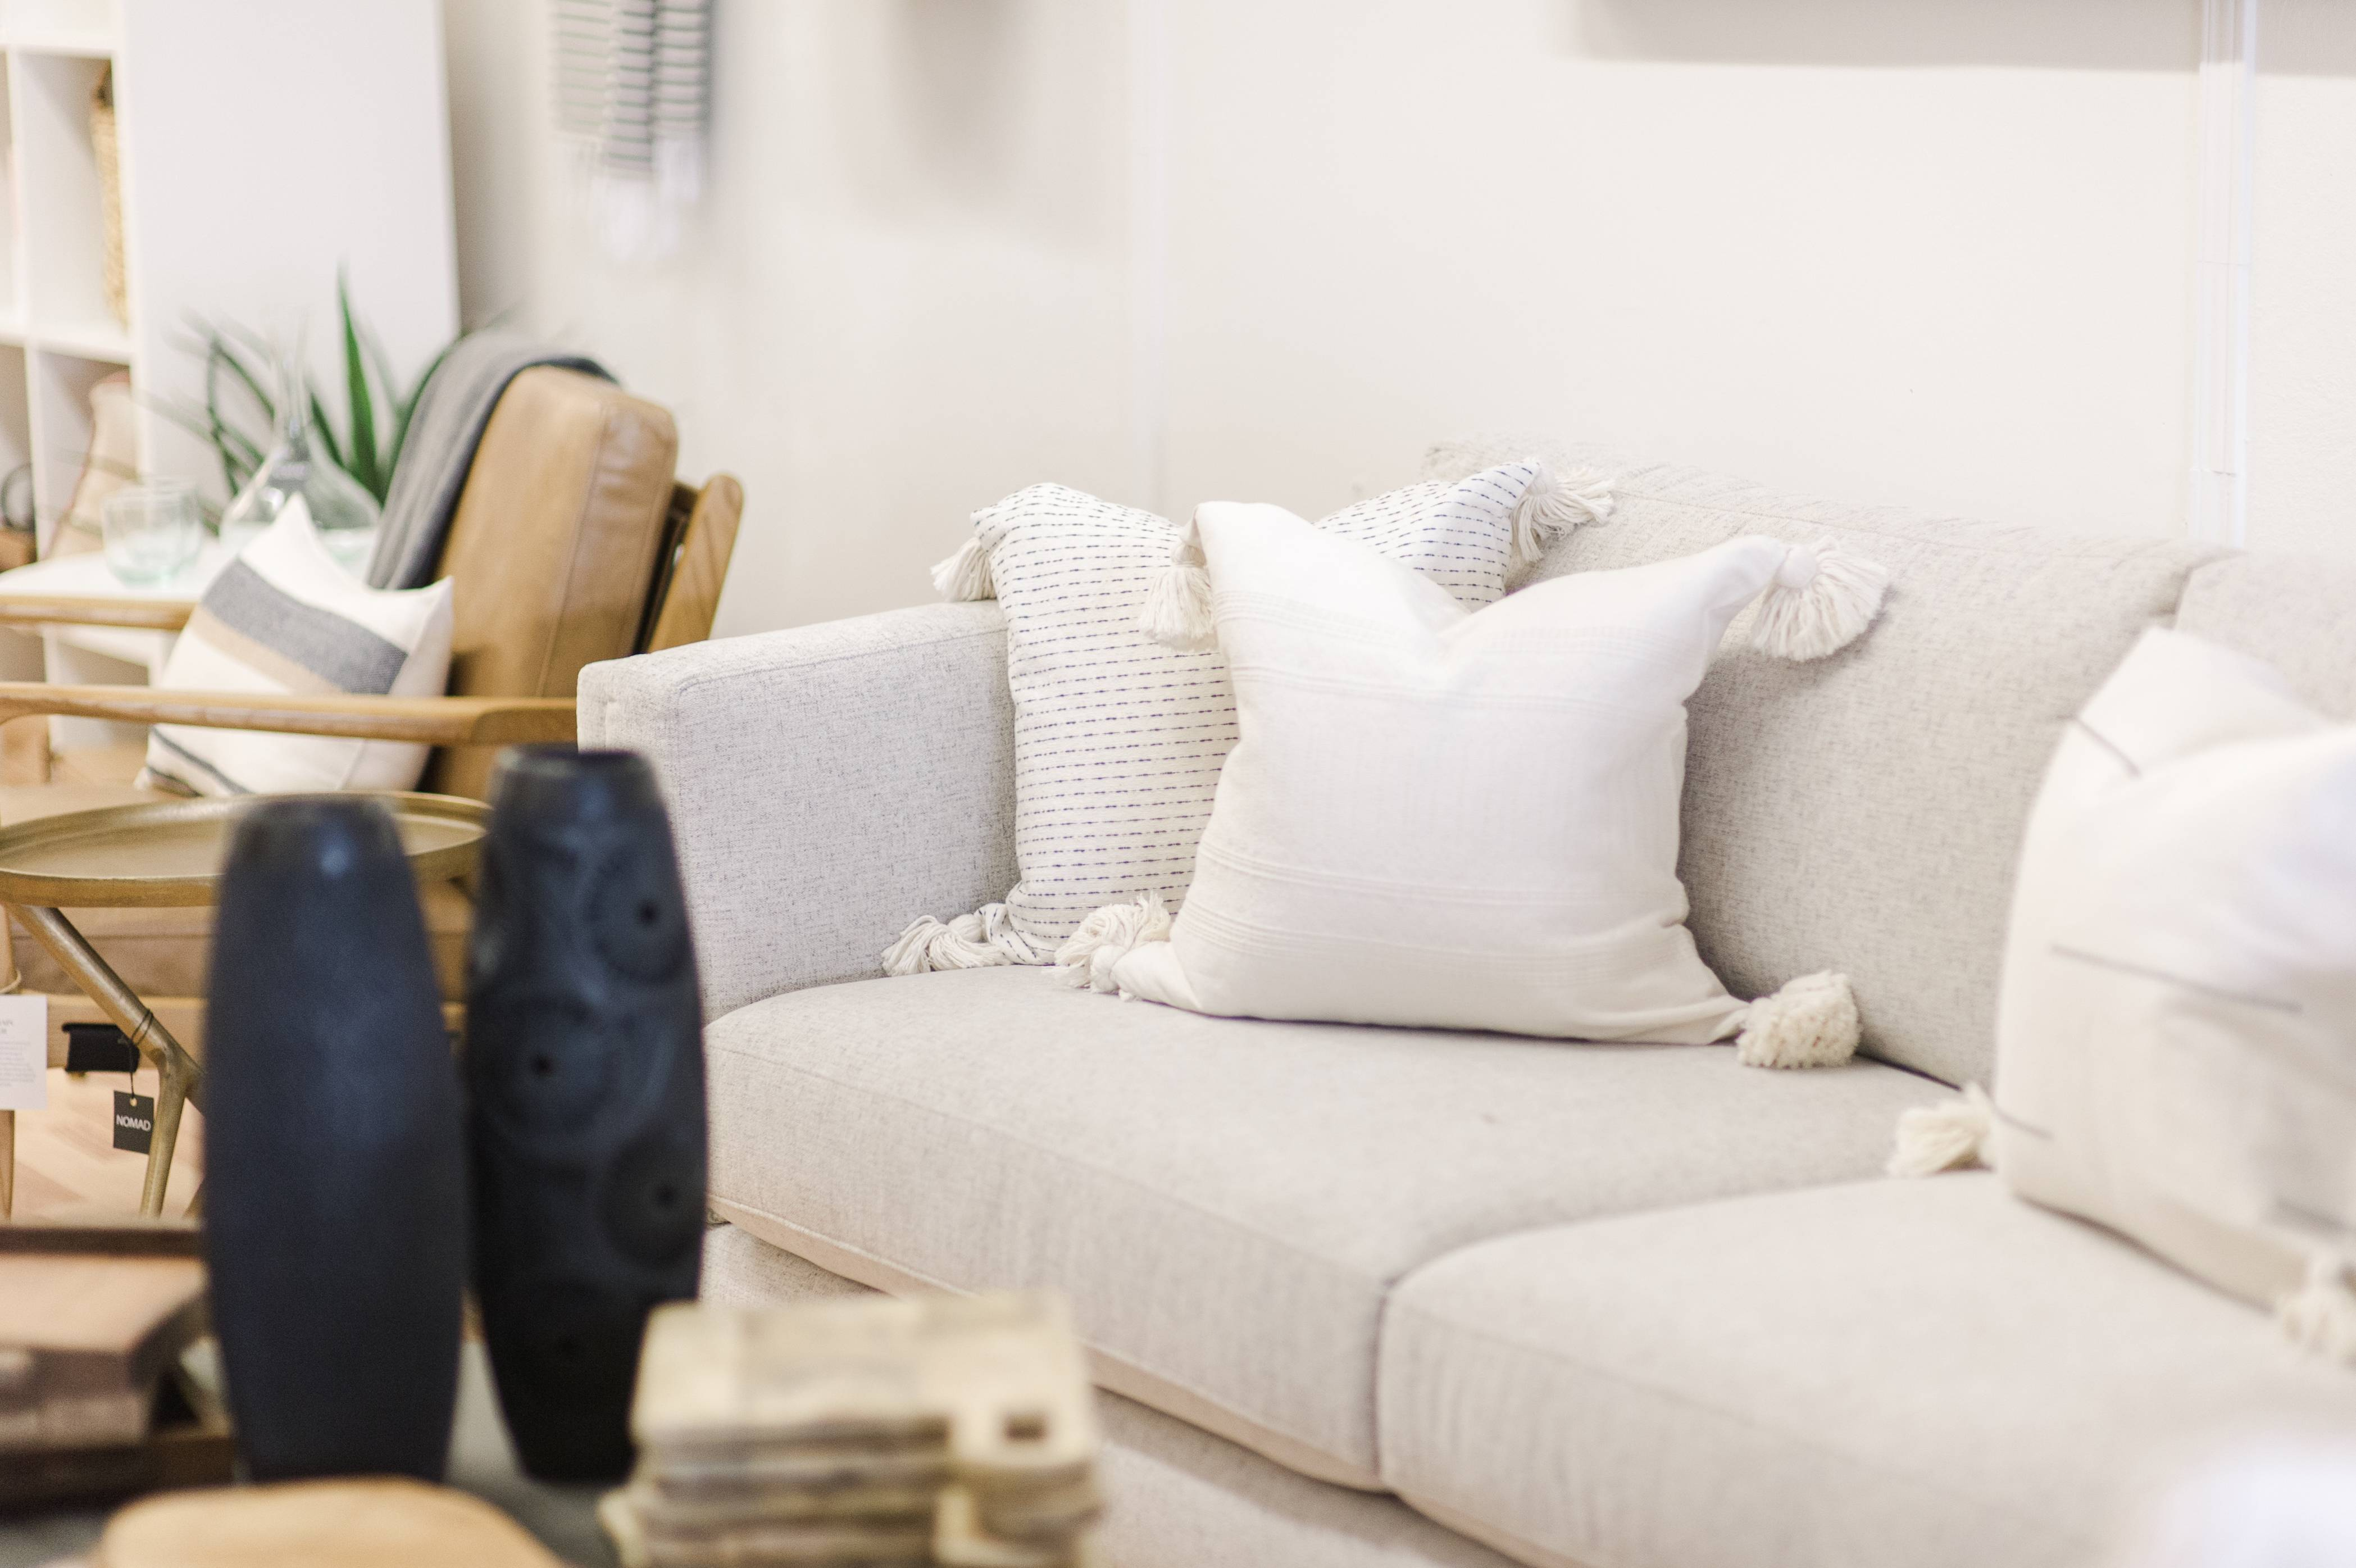 Pillows and Textiles